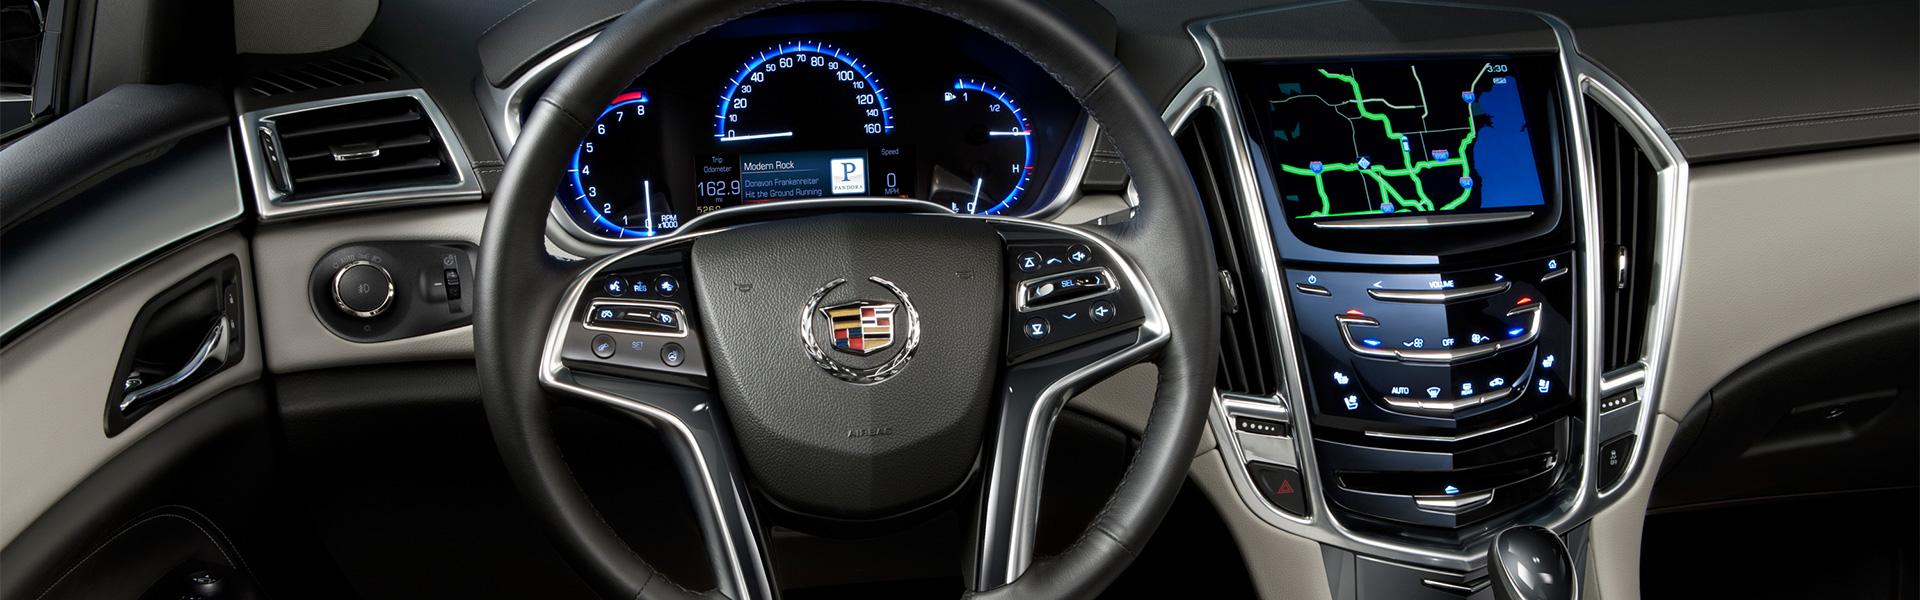 Cadillac srx005